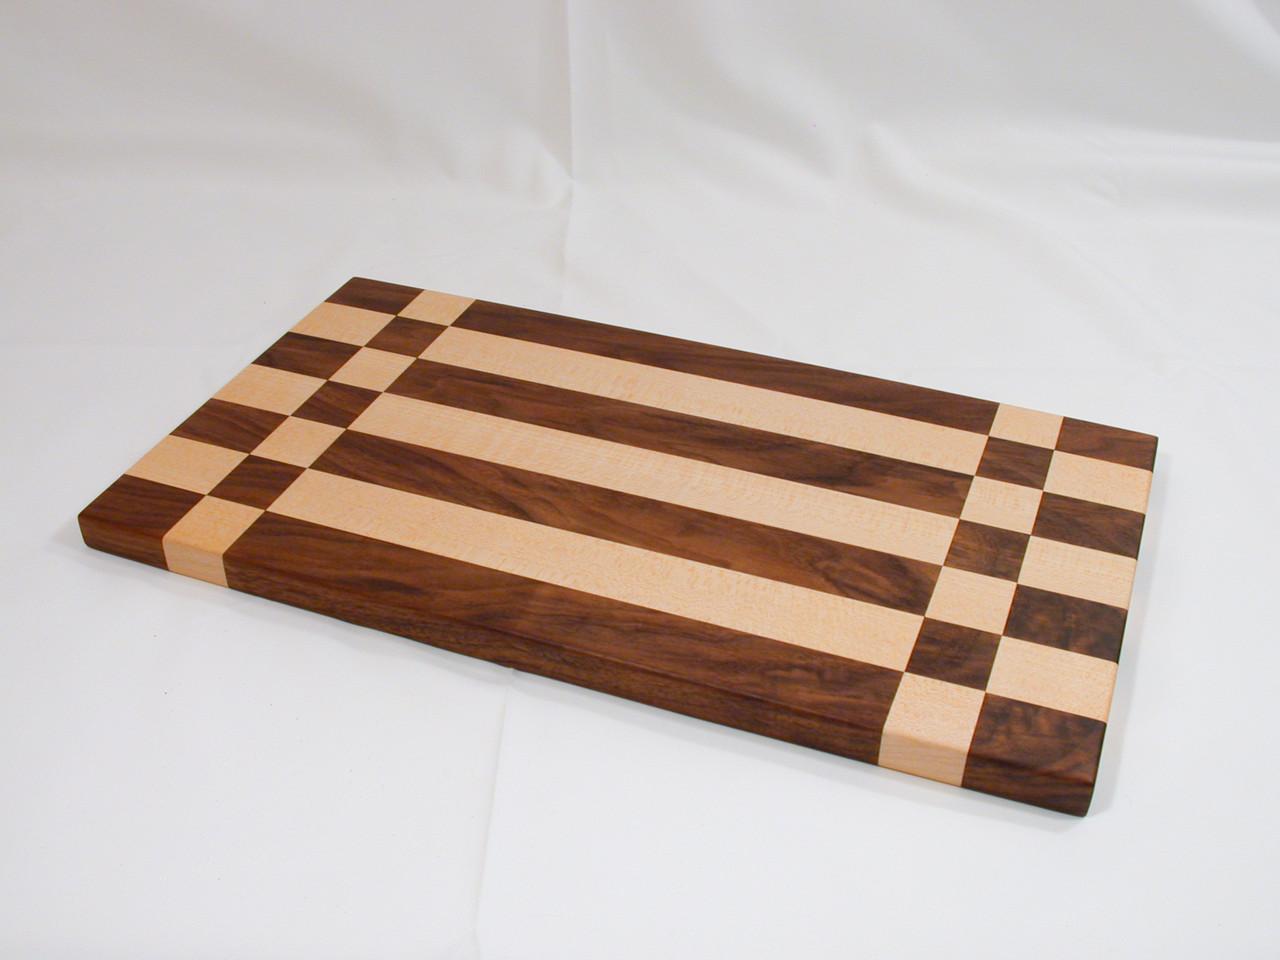 design seetje barnerwood hochwertige holzprodukte schneidebrett holz k chenhelfer. Black Bedroom Furniture Sets. Home Design Ideas